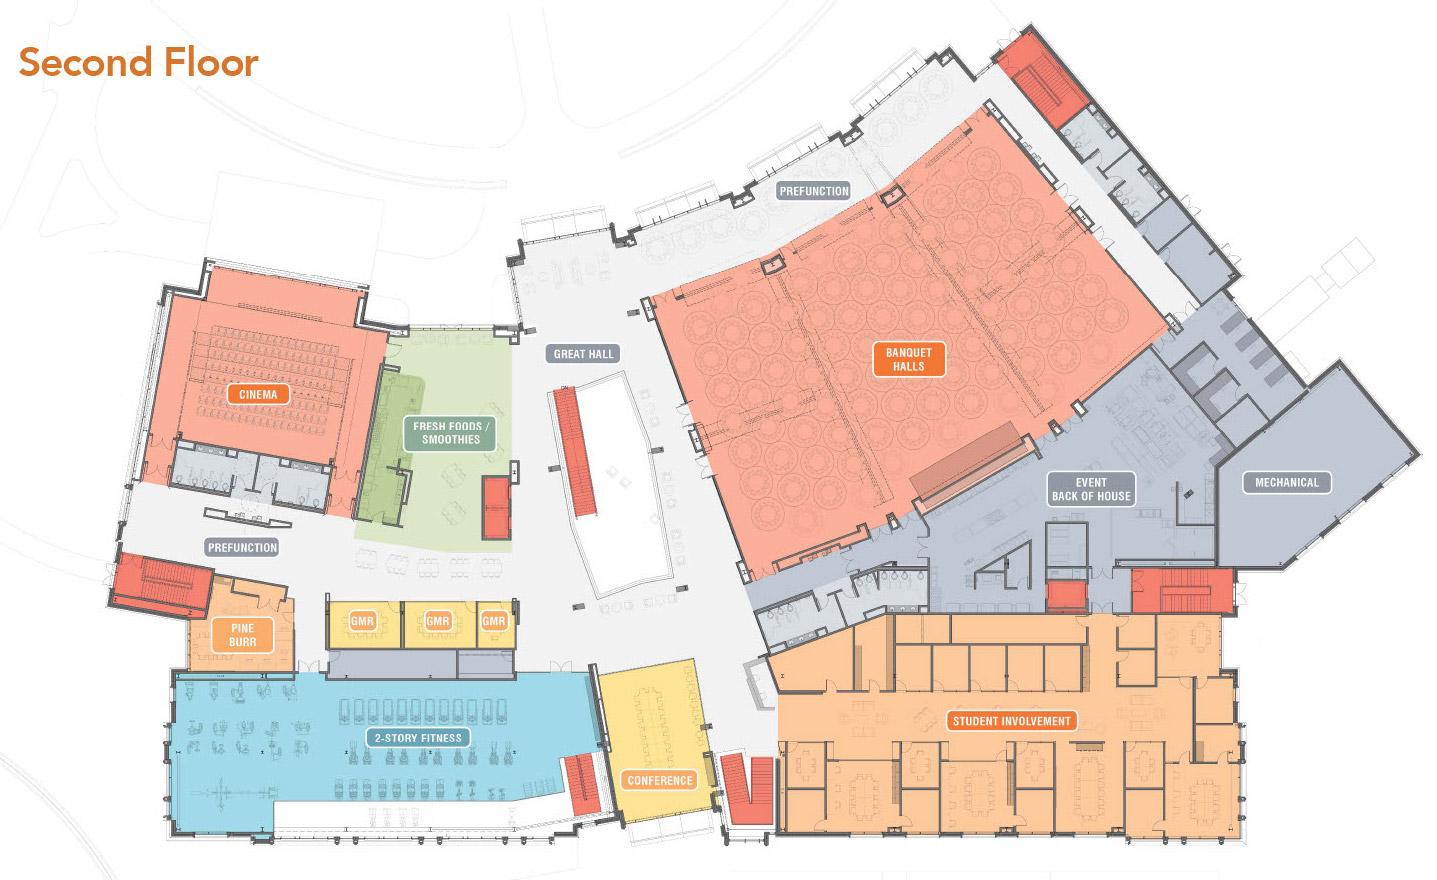 image of student union floor plan 2